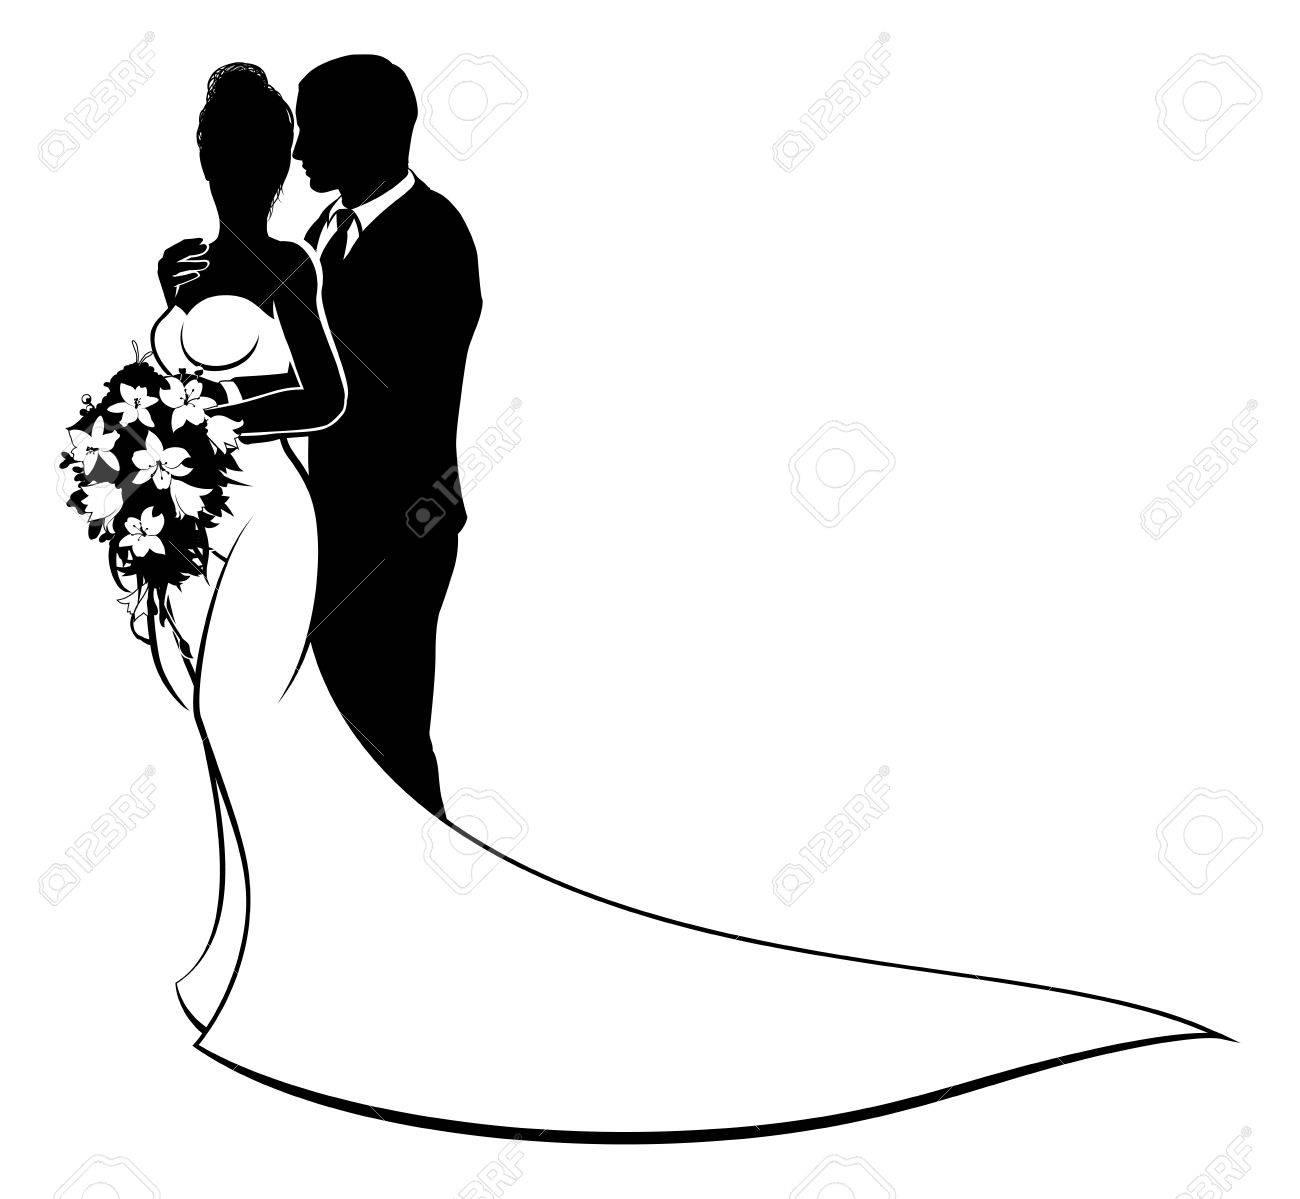 Bride and Groom Husband Wife Wedding Silhouette.